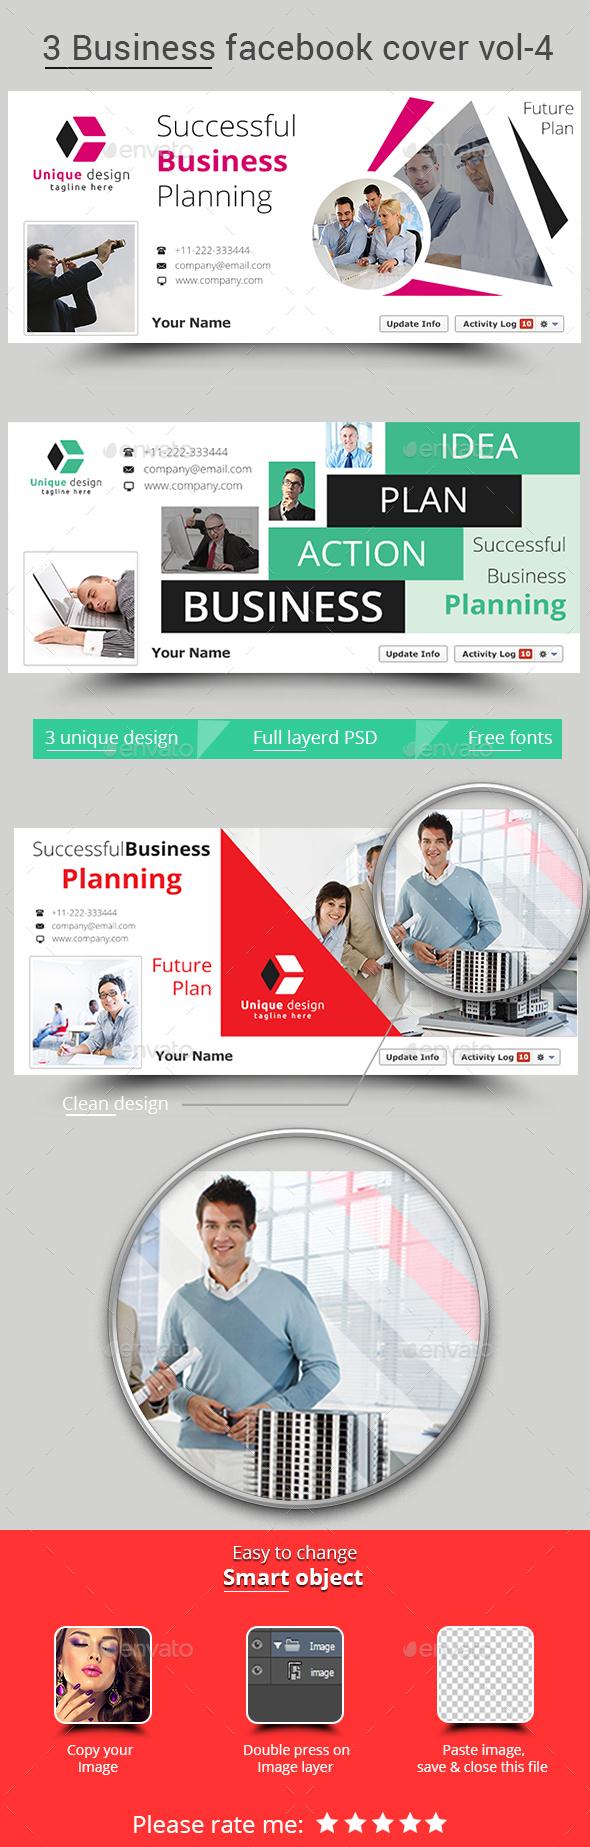 3 Business Facebook Cover Vol-4 - Facebook Timeline Covers Social Media